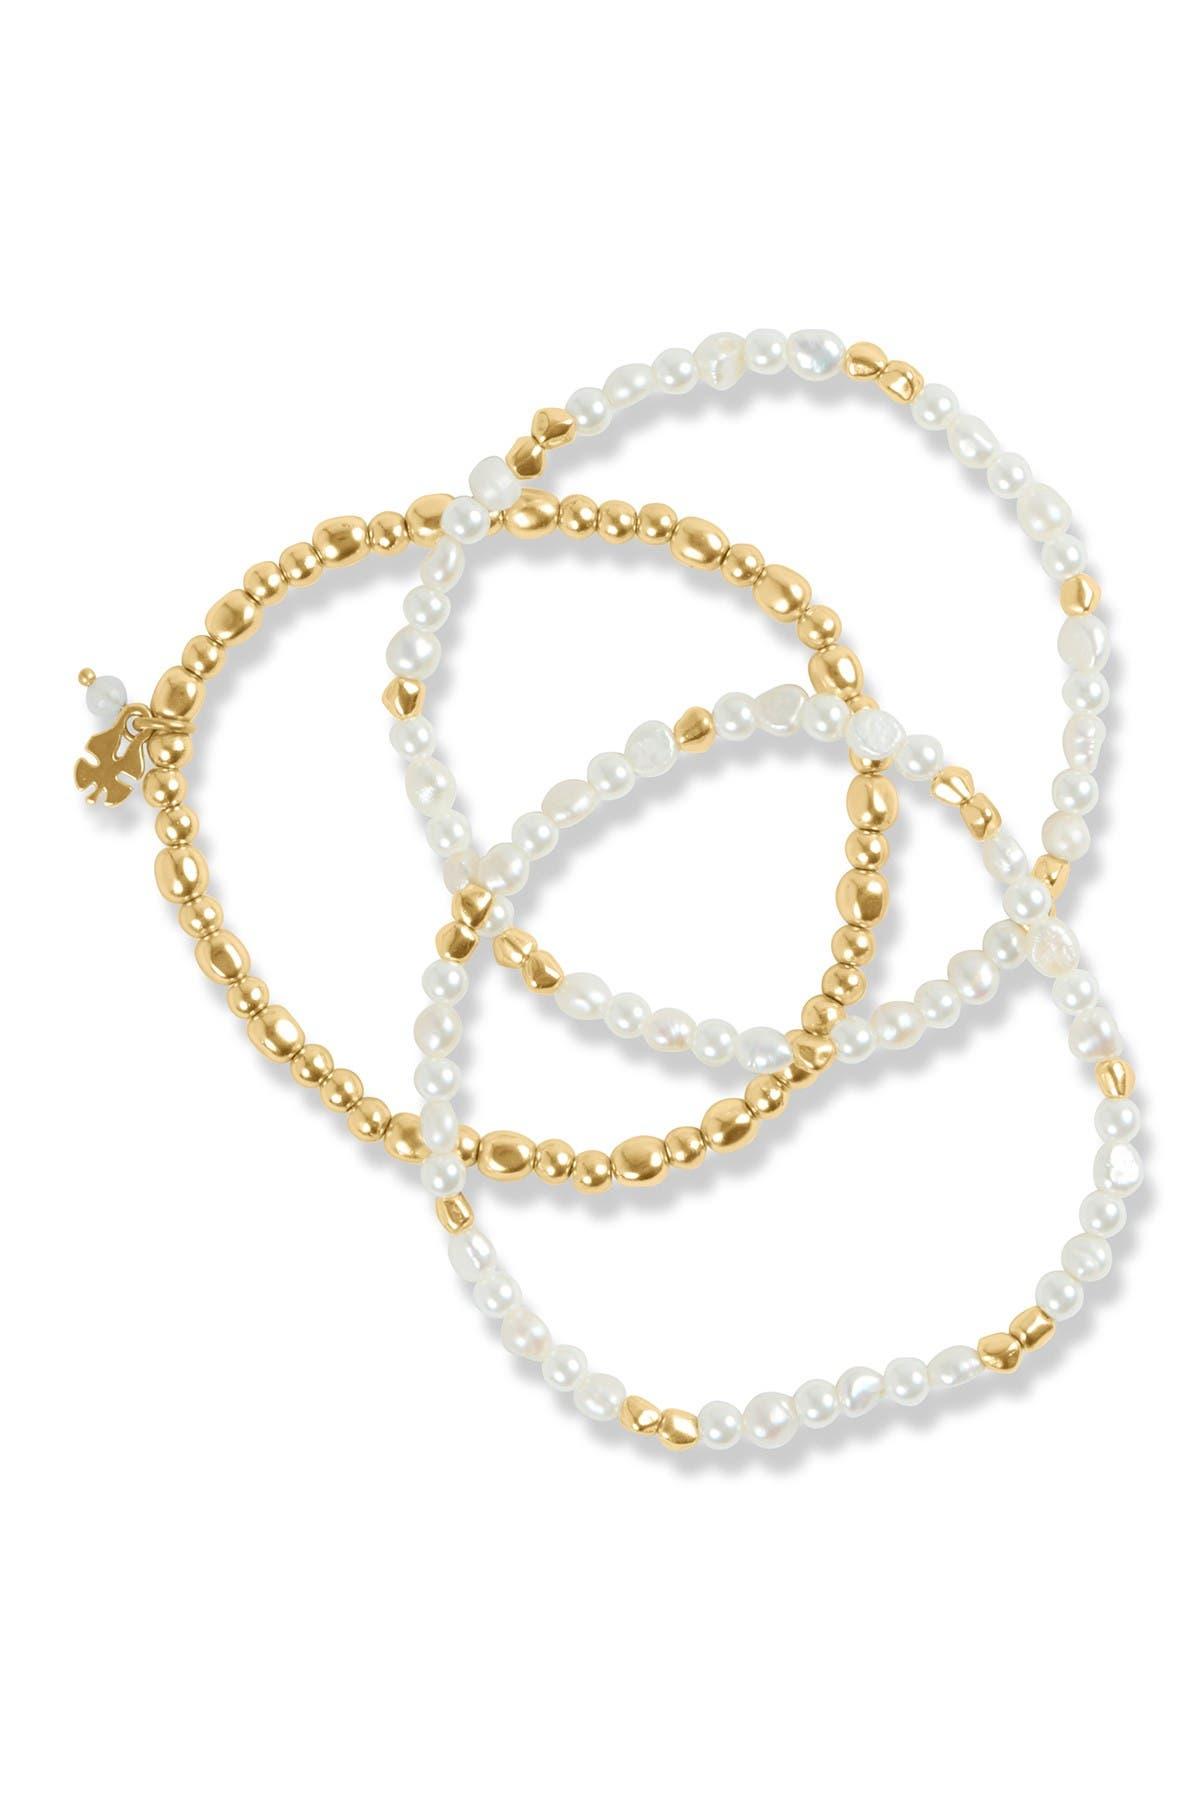 Image of Lucky Brand Imitation & Freshwater Pearl Beaded Bracelet Set - Set of 3